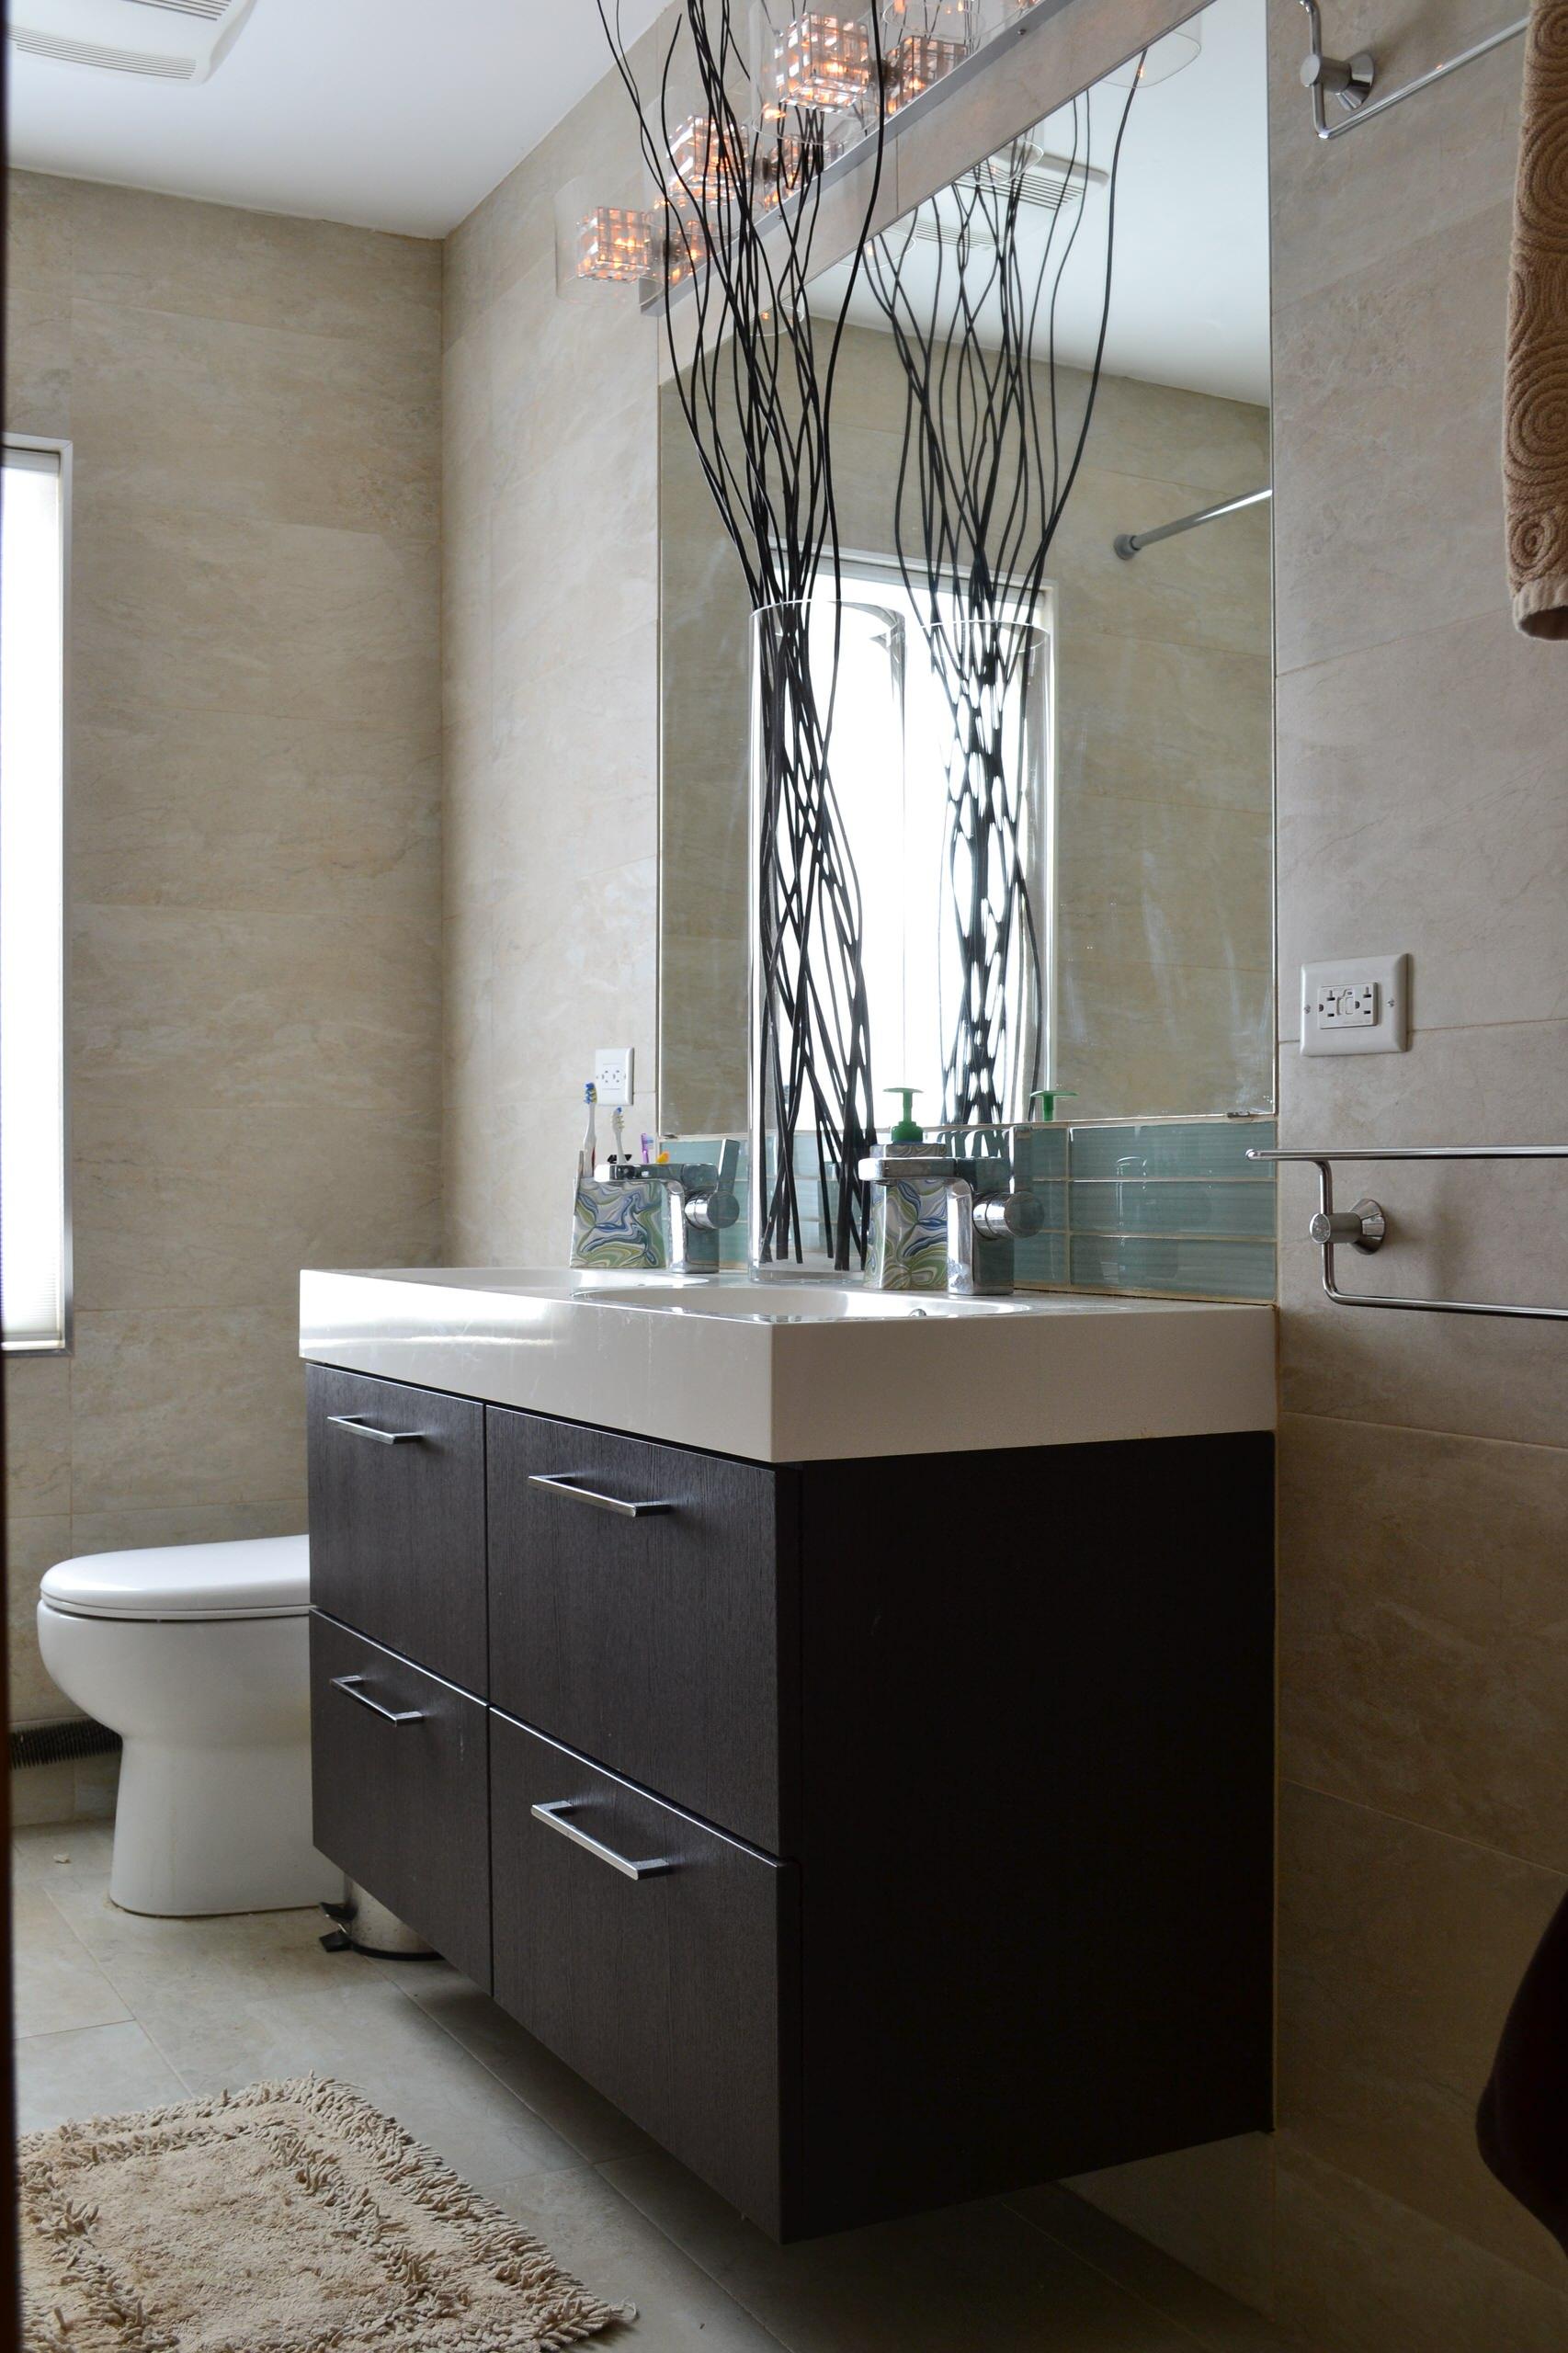 Bathroom in natural tones